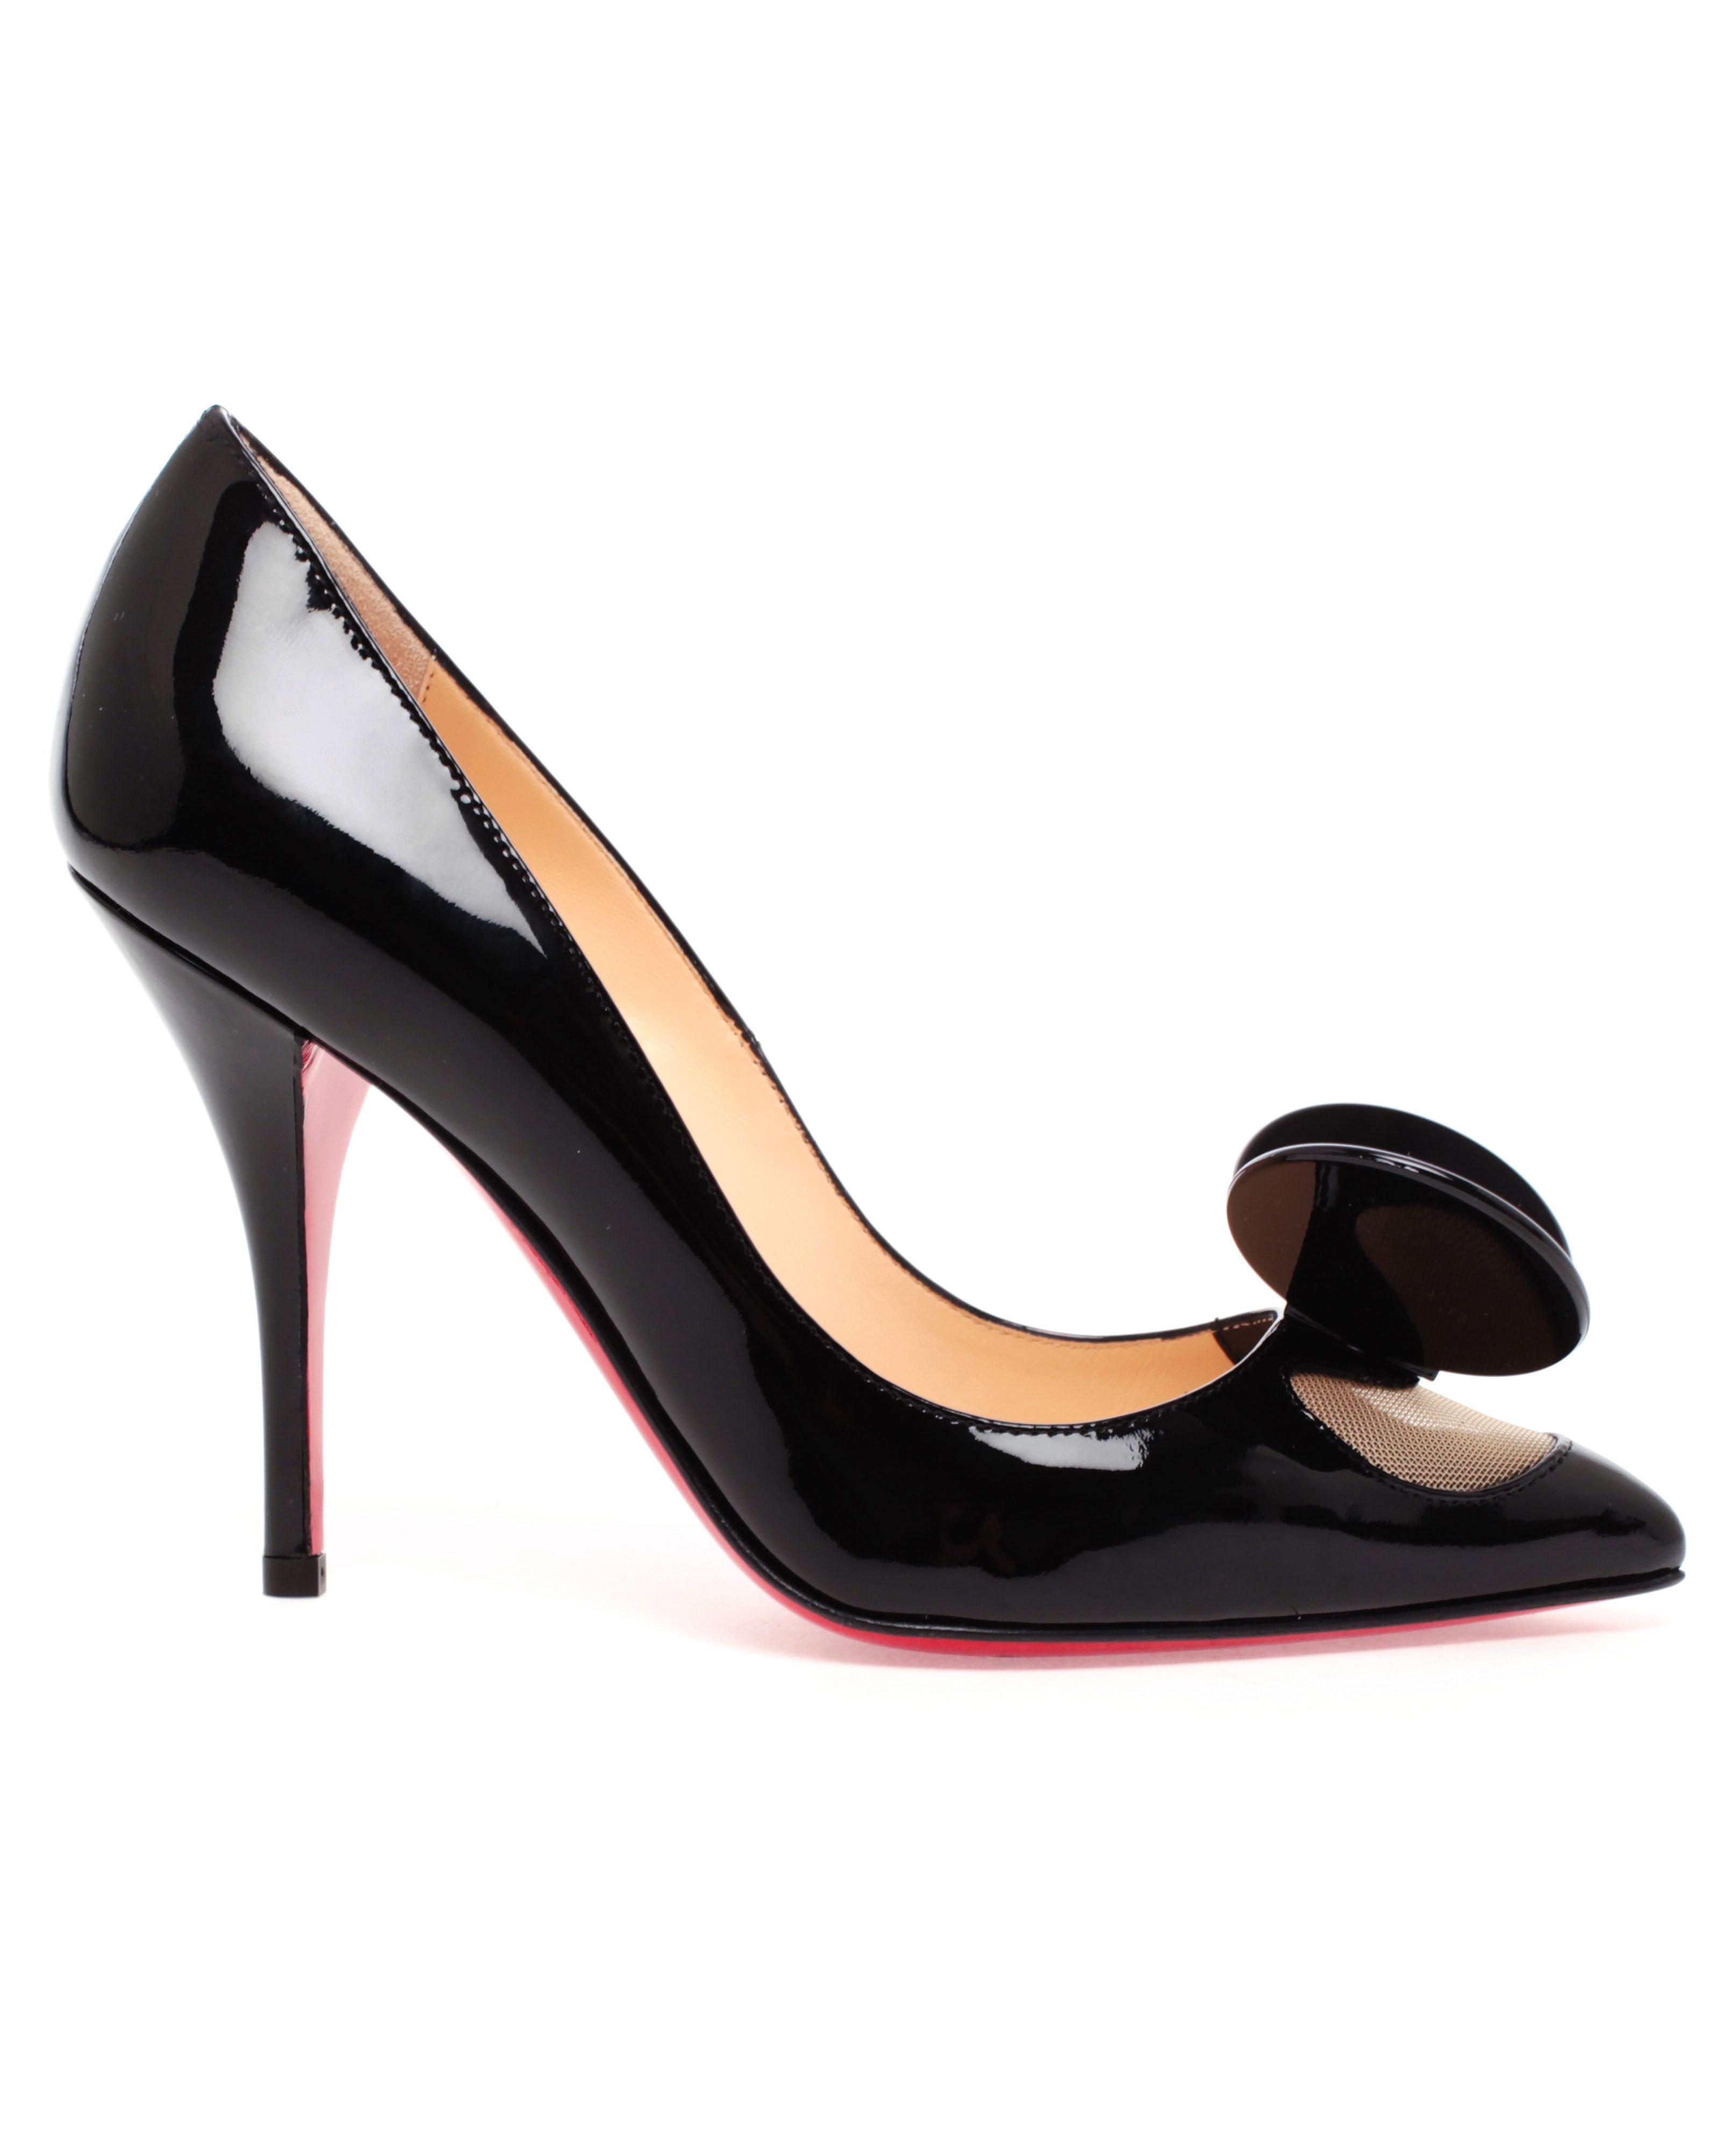 new styles d56e8 10059 Artesur » christian louboutin Madame mouse Black Patent leather